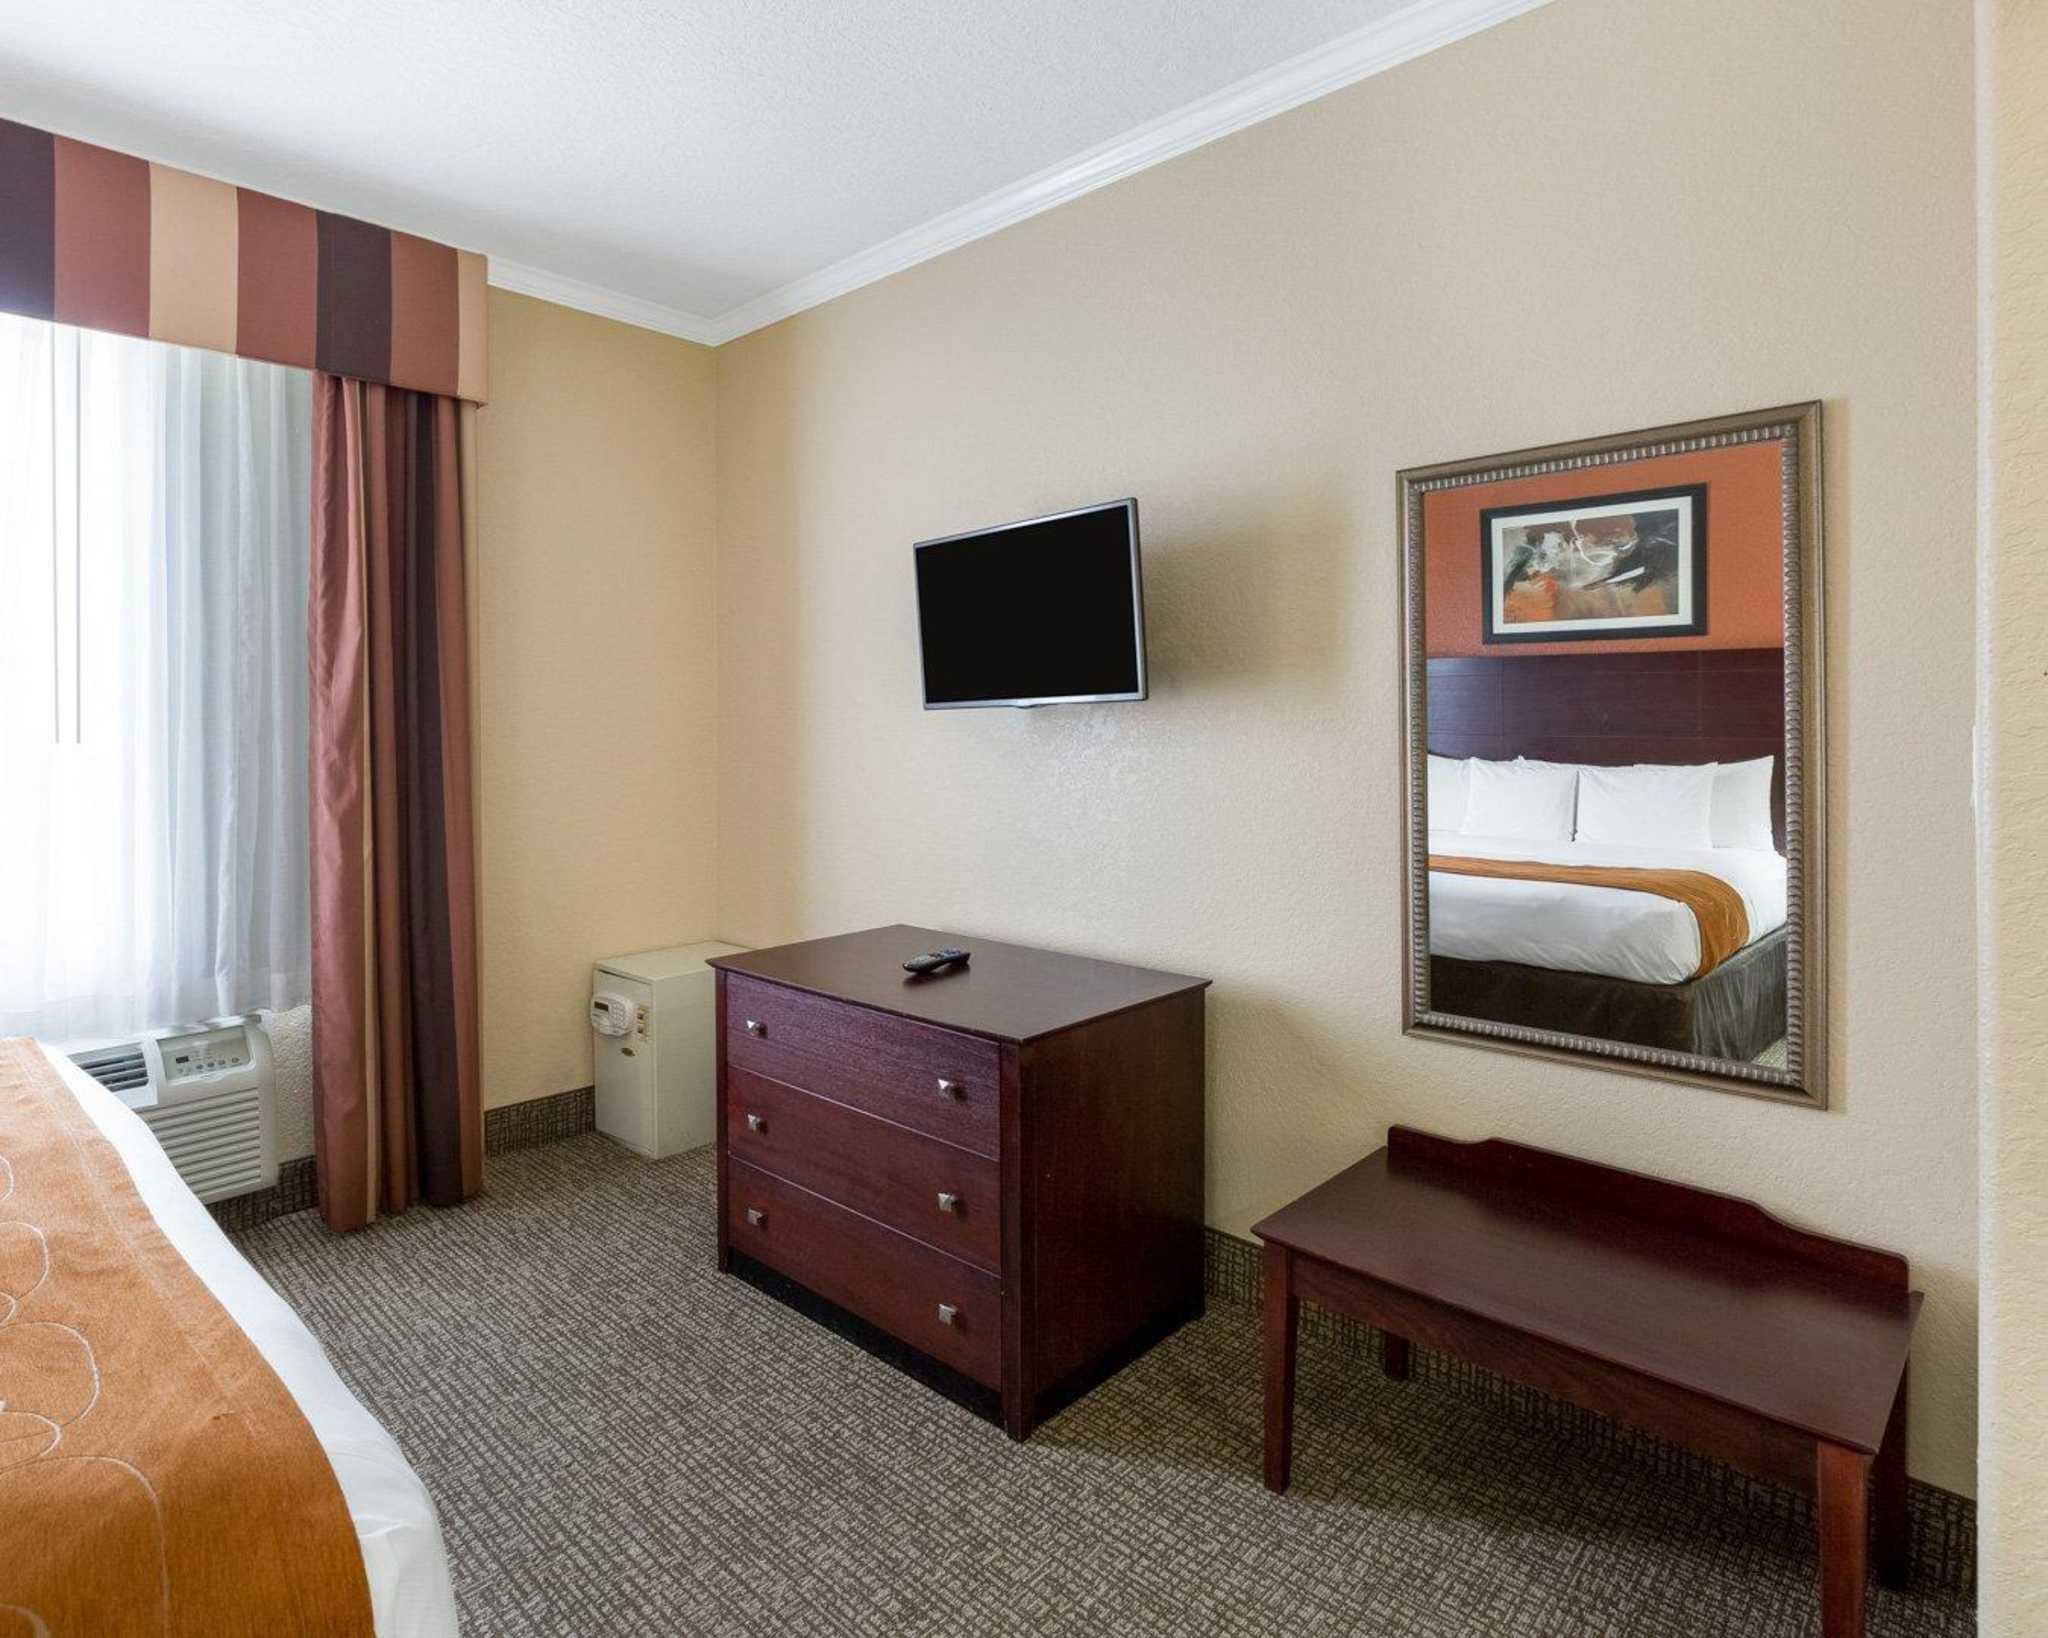 Comfort Suites image 36